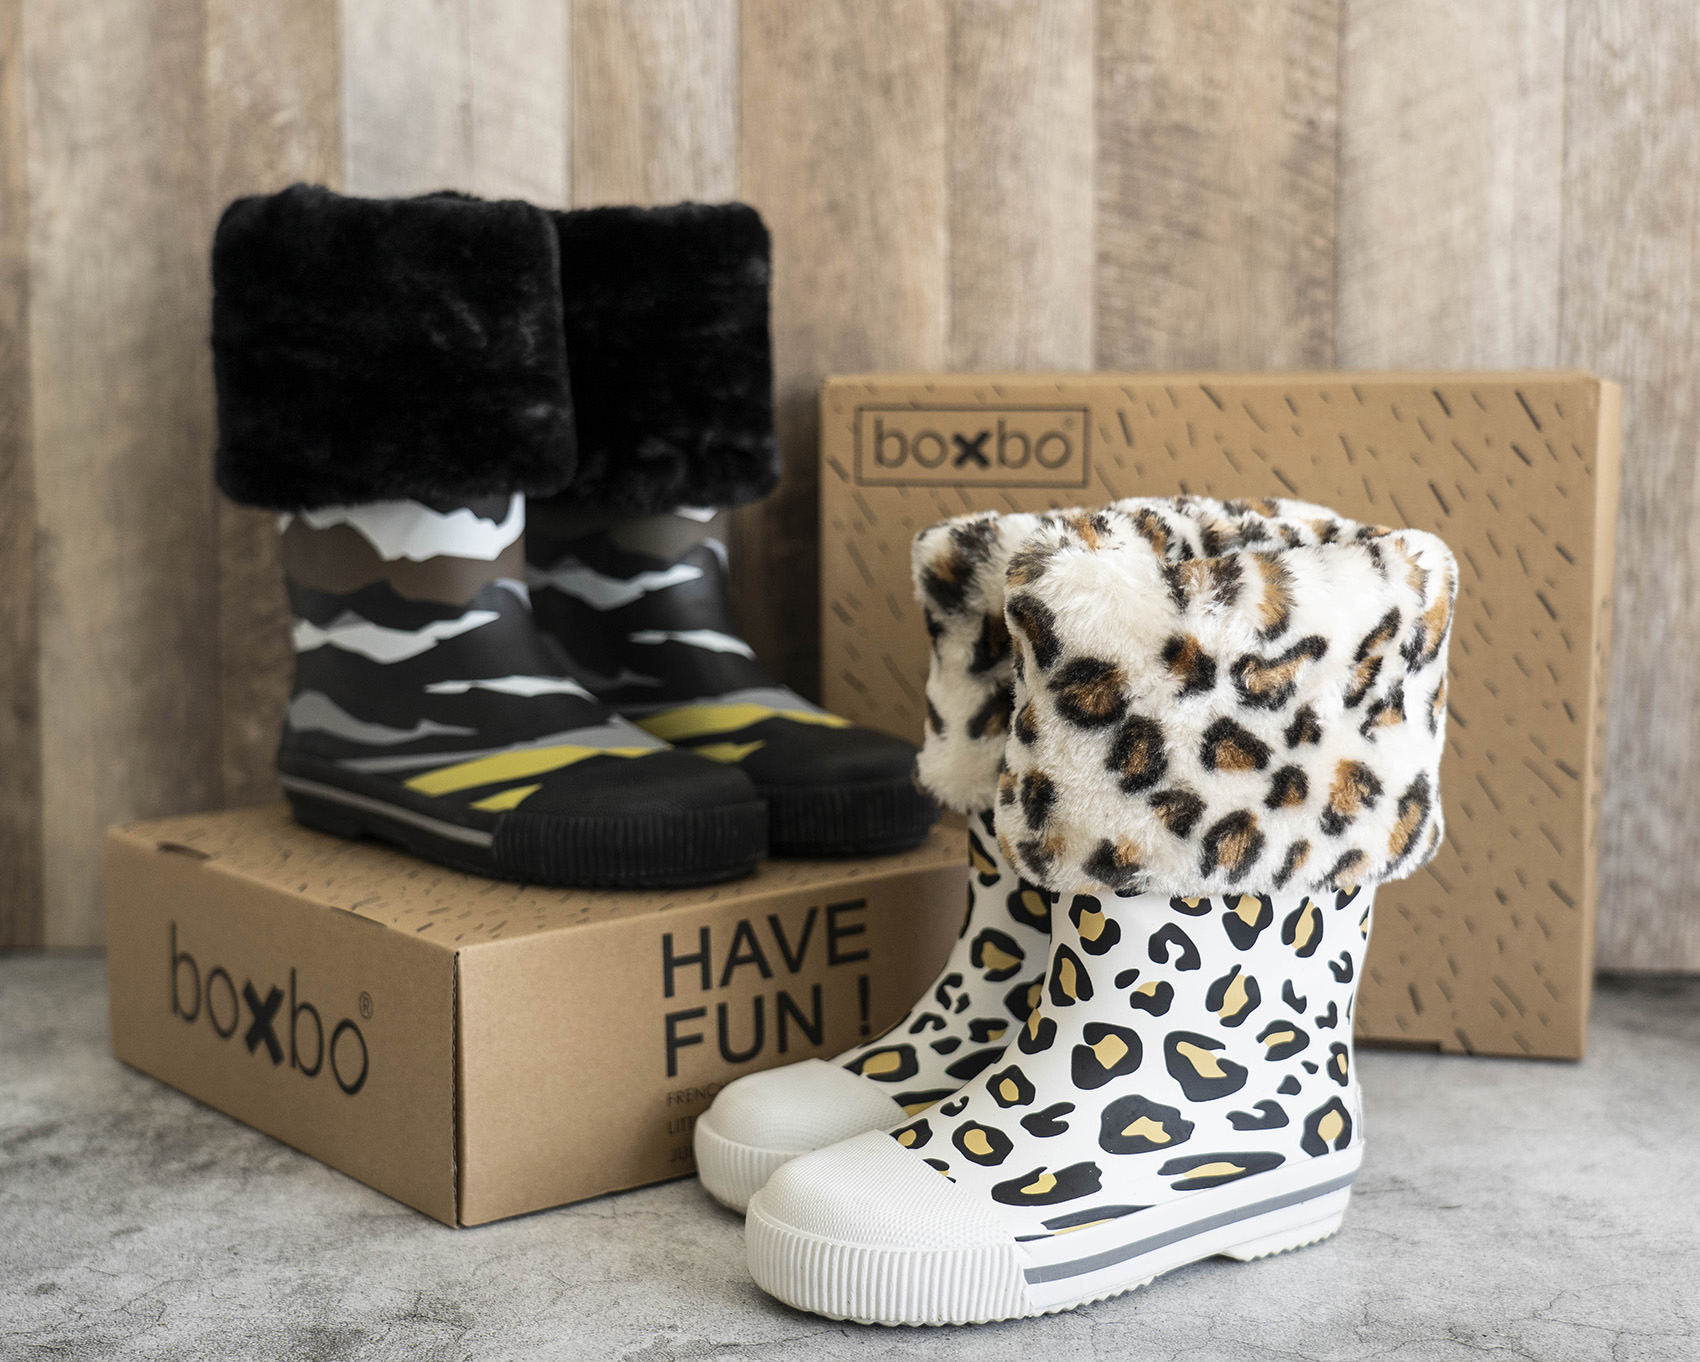 Boxbo 愛時尚 冬天雨靴